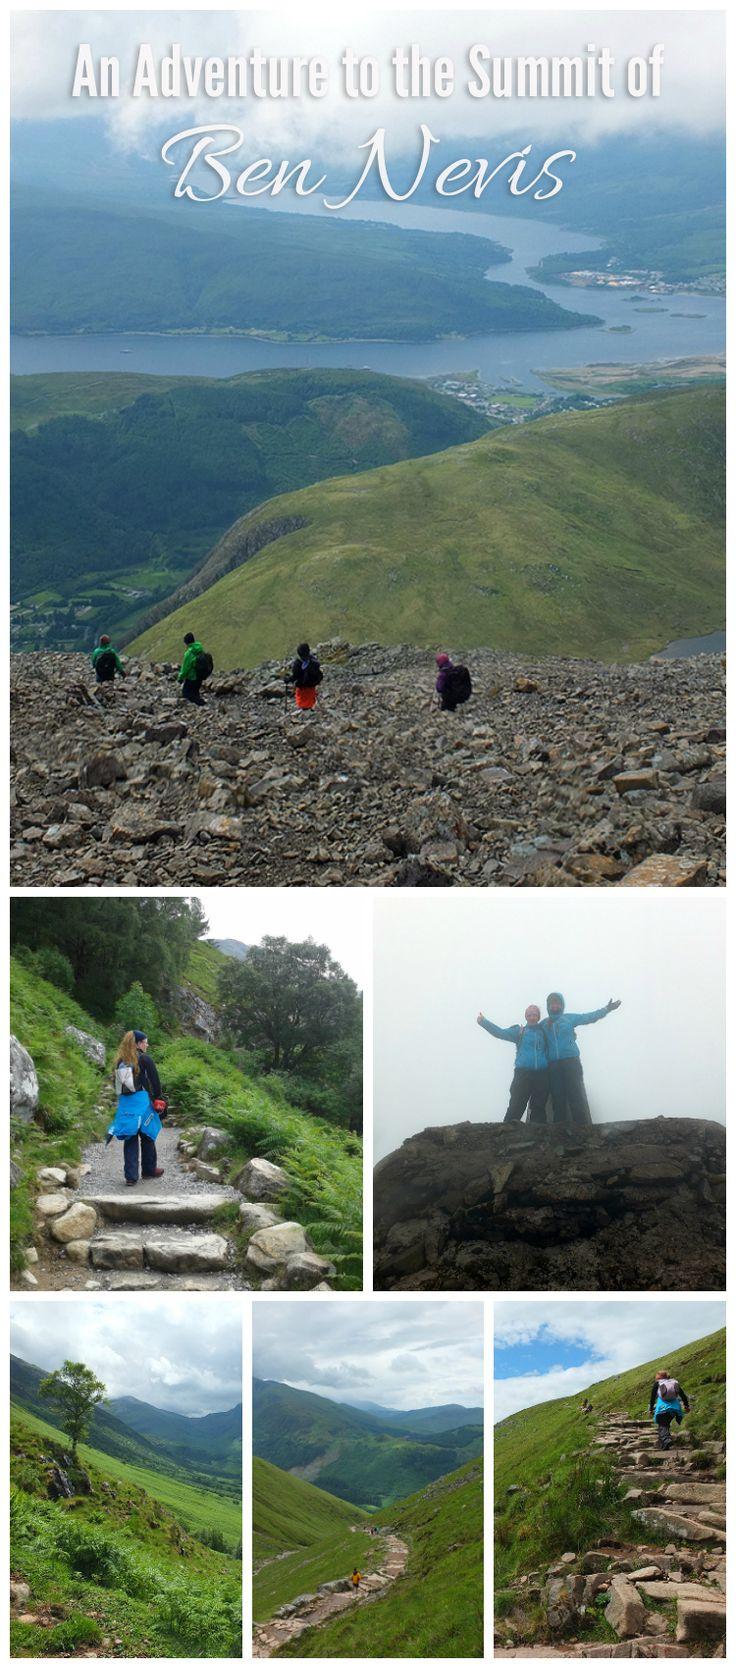 After nine days bikepacking through Scotland we climb to the summit of Ben Nevis, Britain's highest mountain.